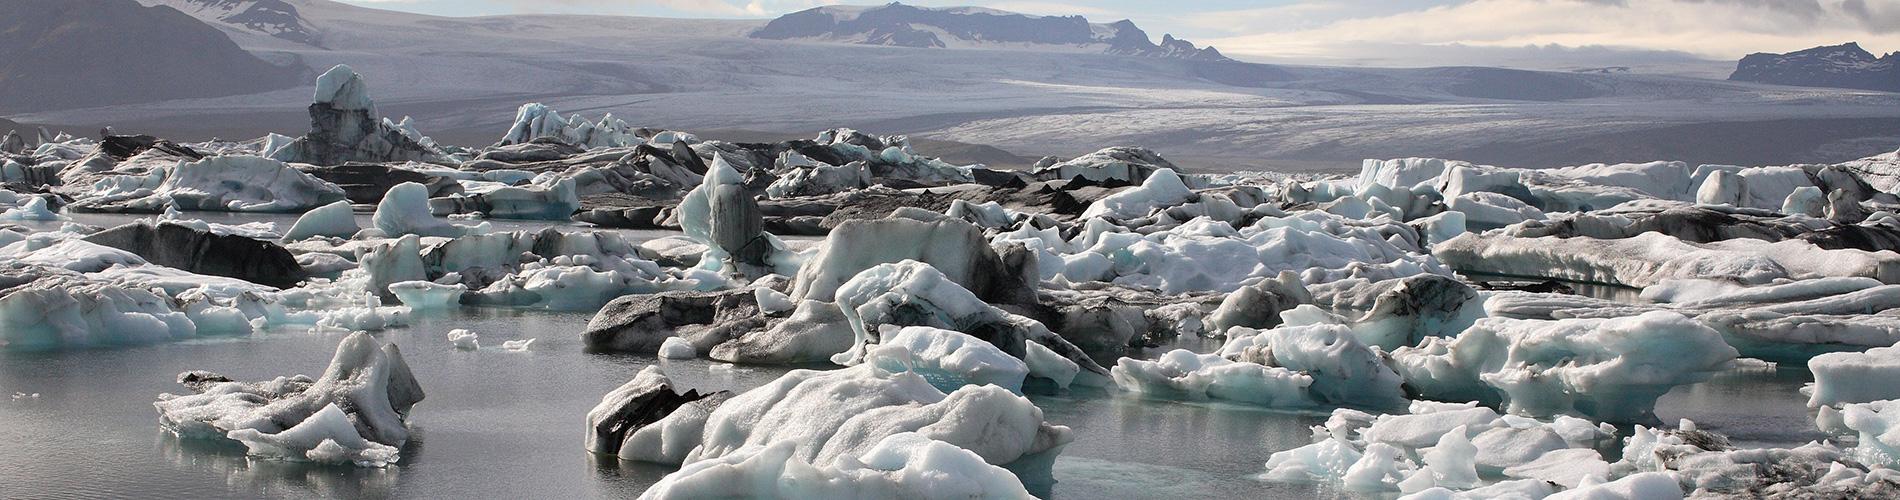 homepage-changementclimatique